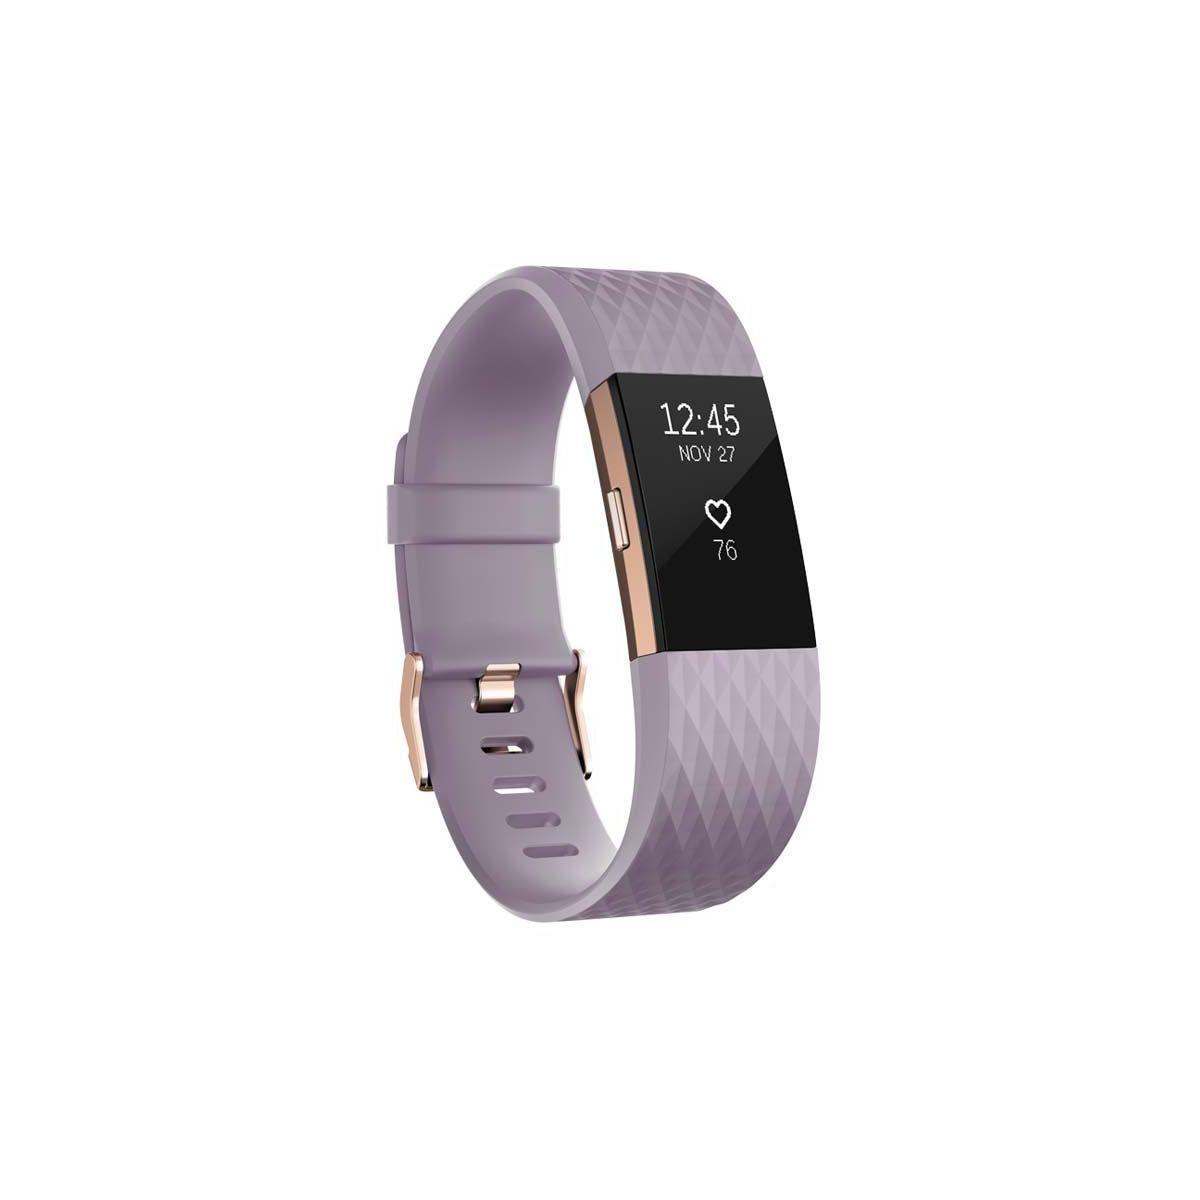 Tracker fitbit charge2 lavender rose gol - 10% de remise imm?d...